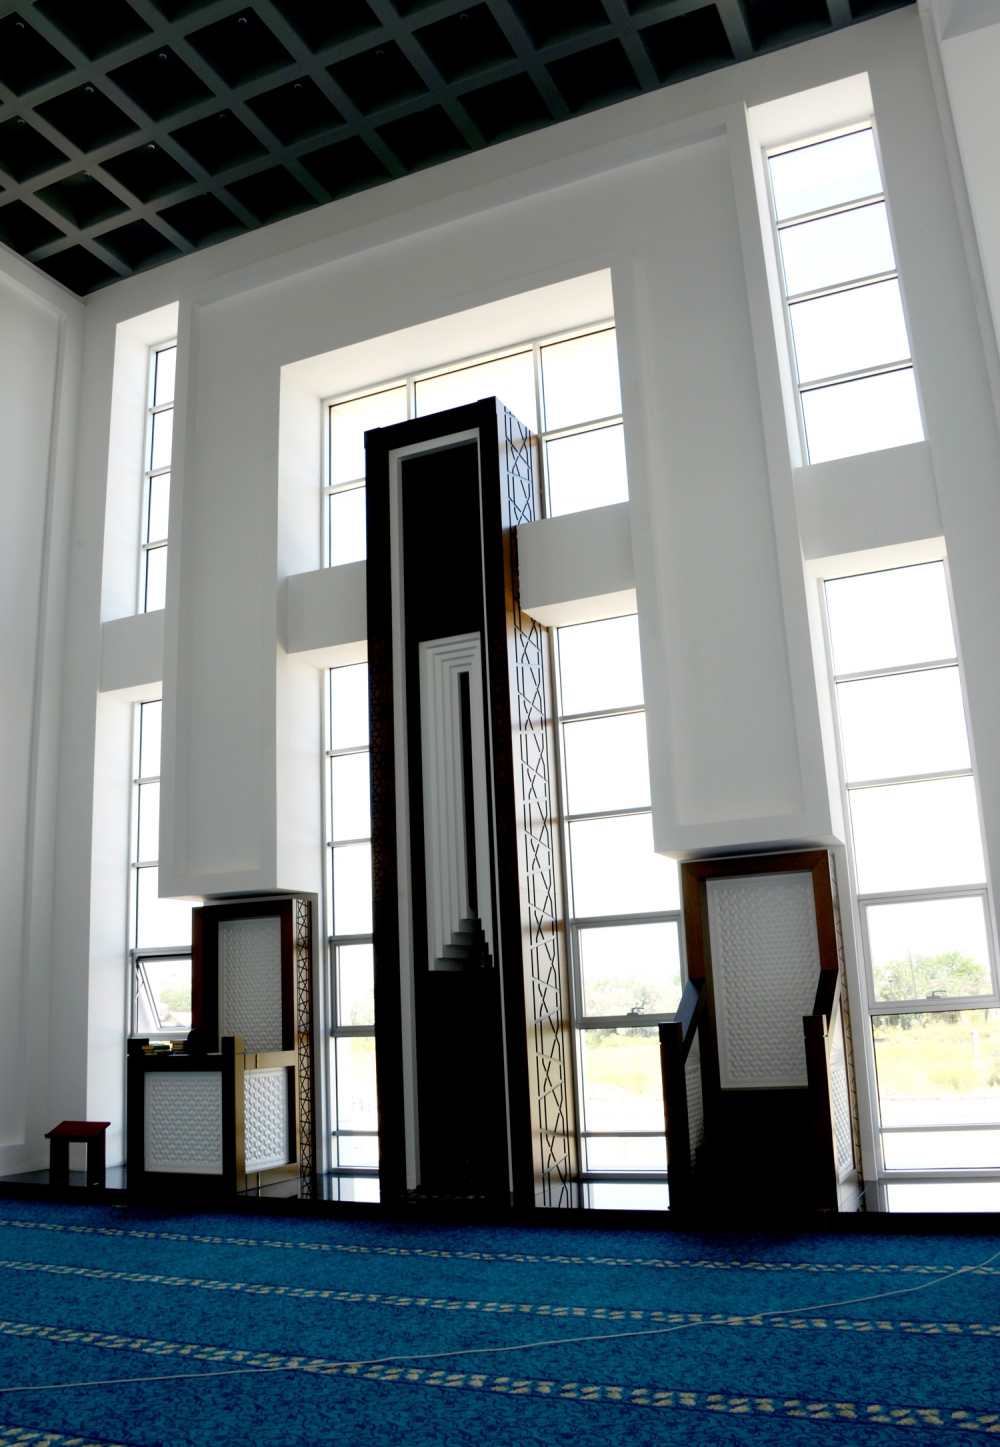 Meram'a 1800 kişilik cami 6